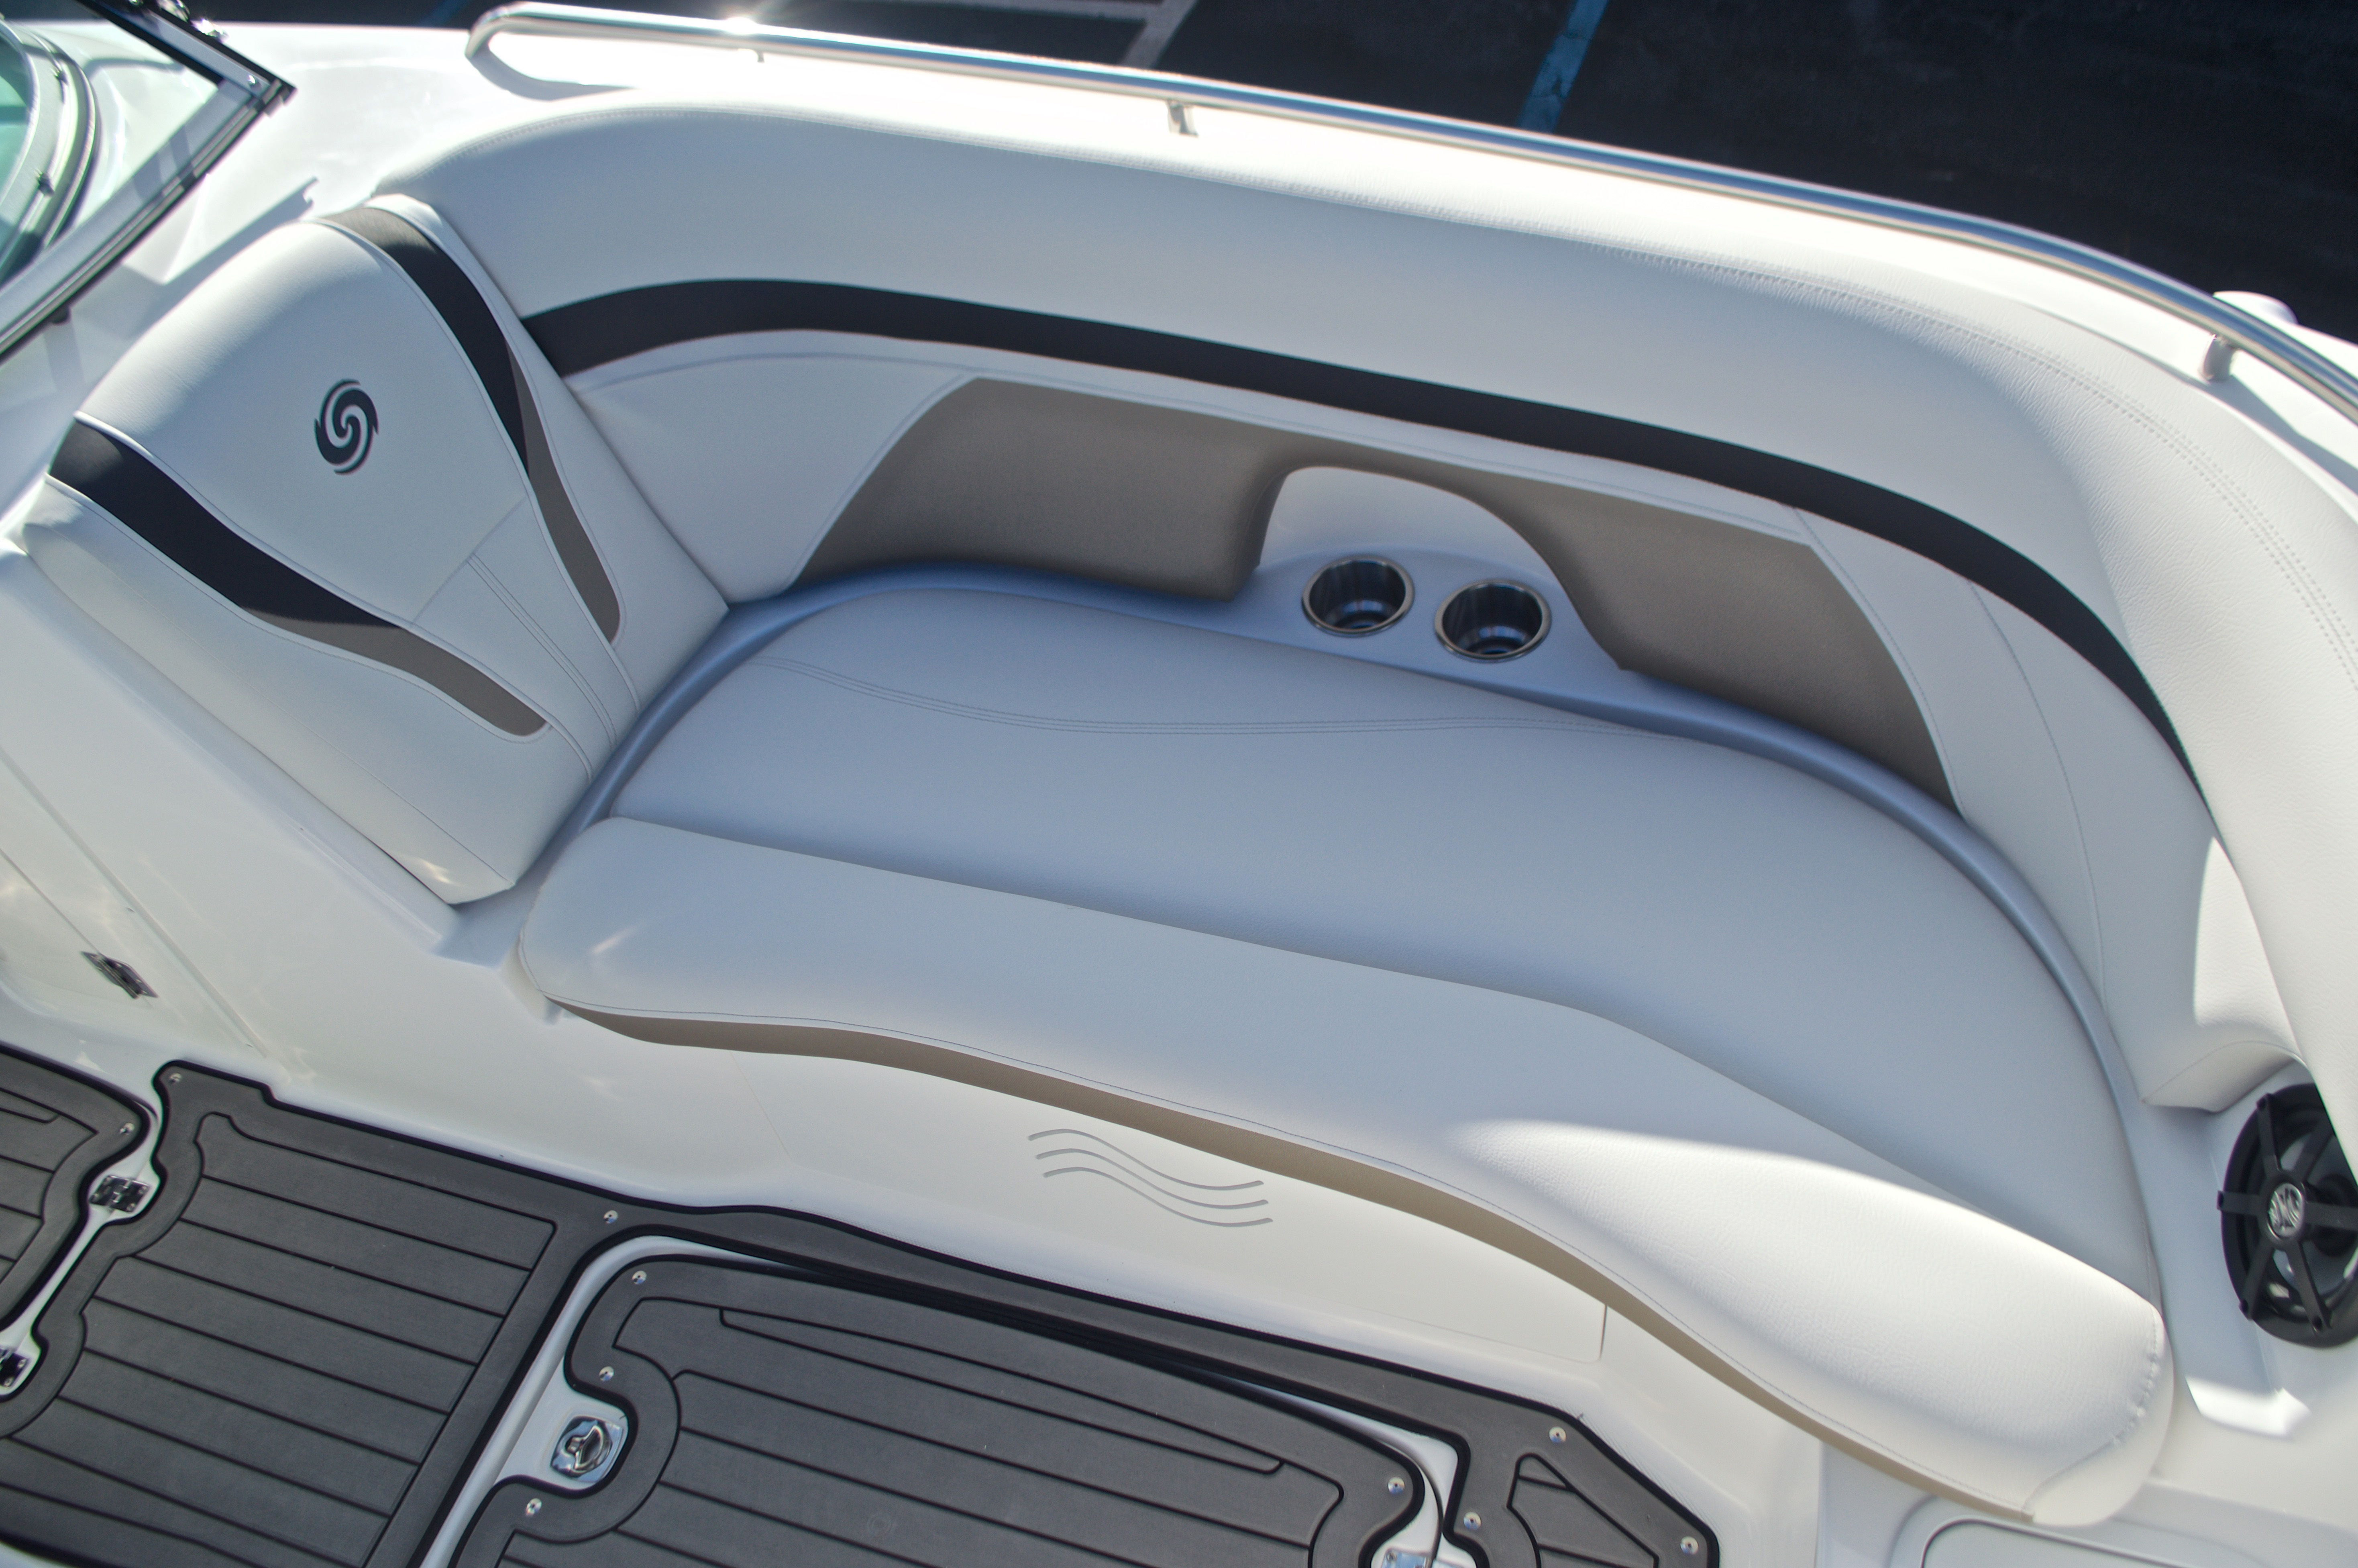 Thumbnail 58 for New 2017 Hurricane SunDeck SD 2400 OB boat for sale in Miami, FL